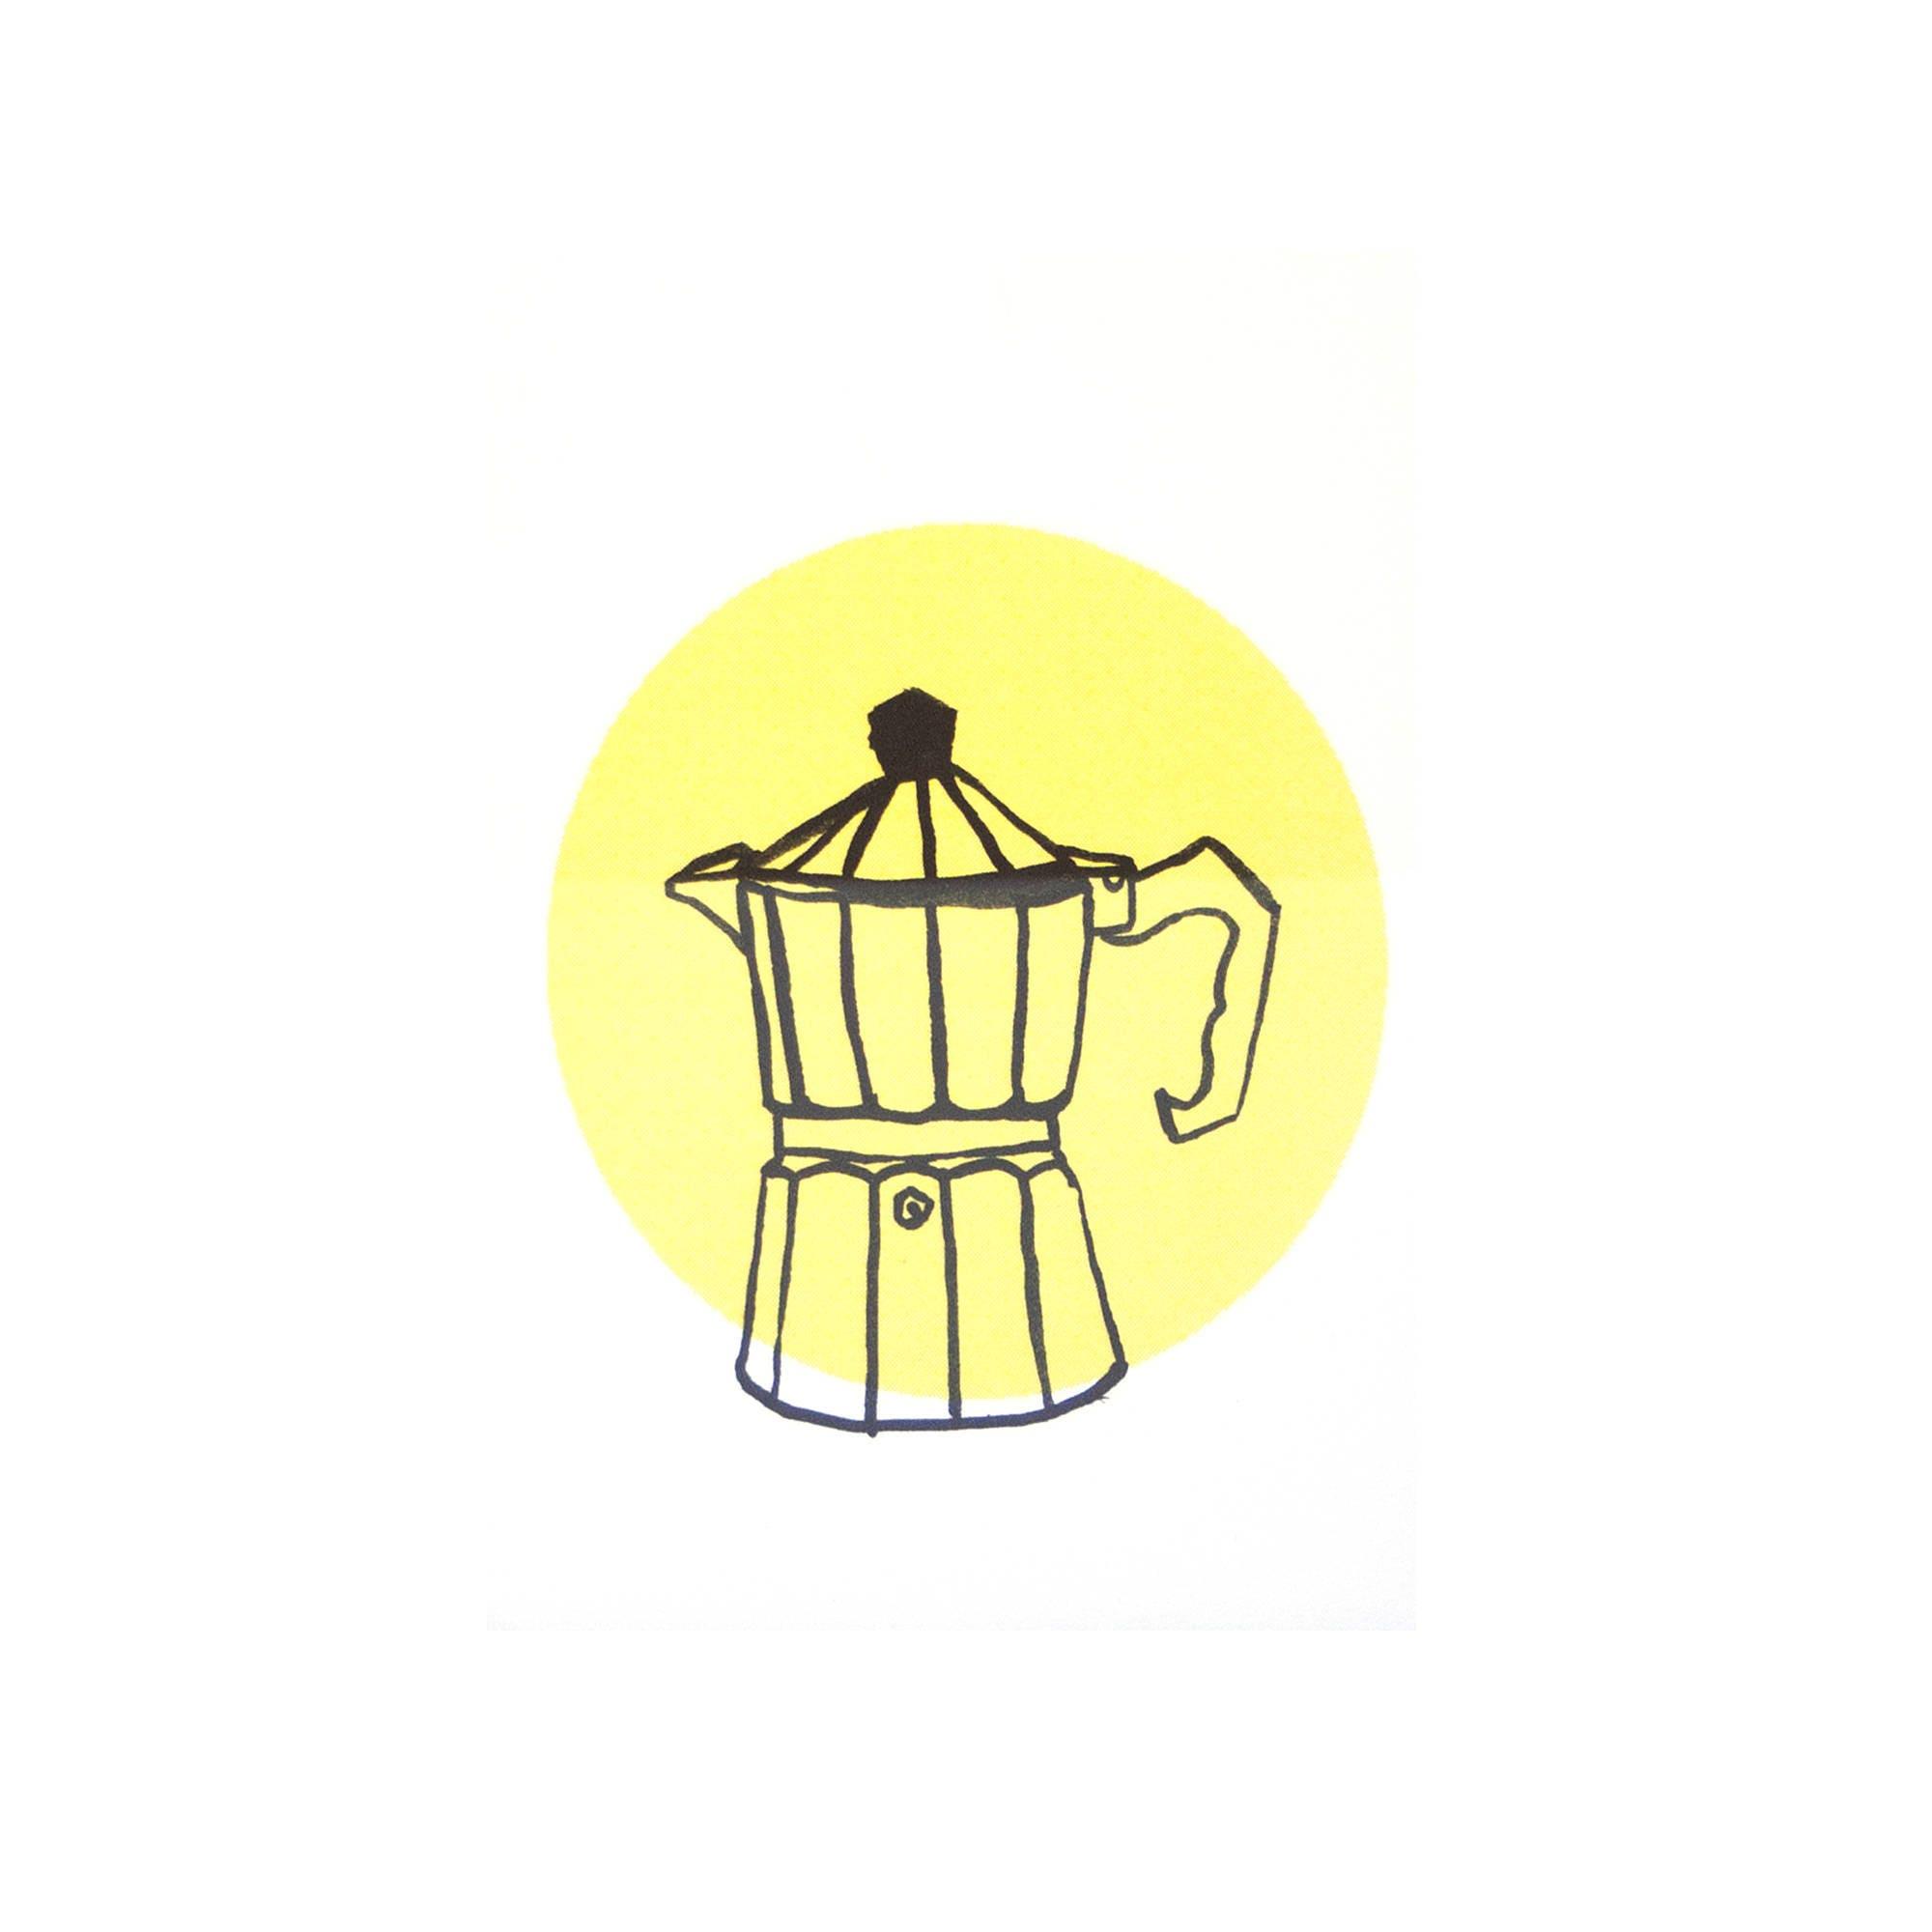 Riso print coffee, percolator, yellow wall decoration, art, print ...